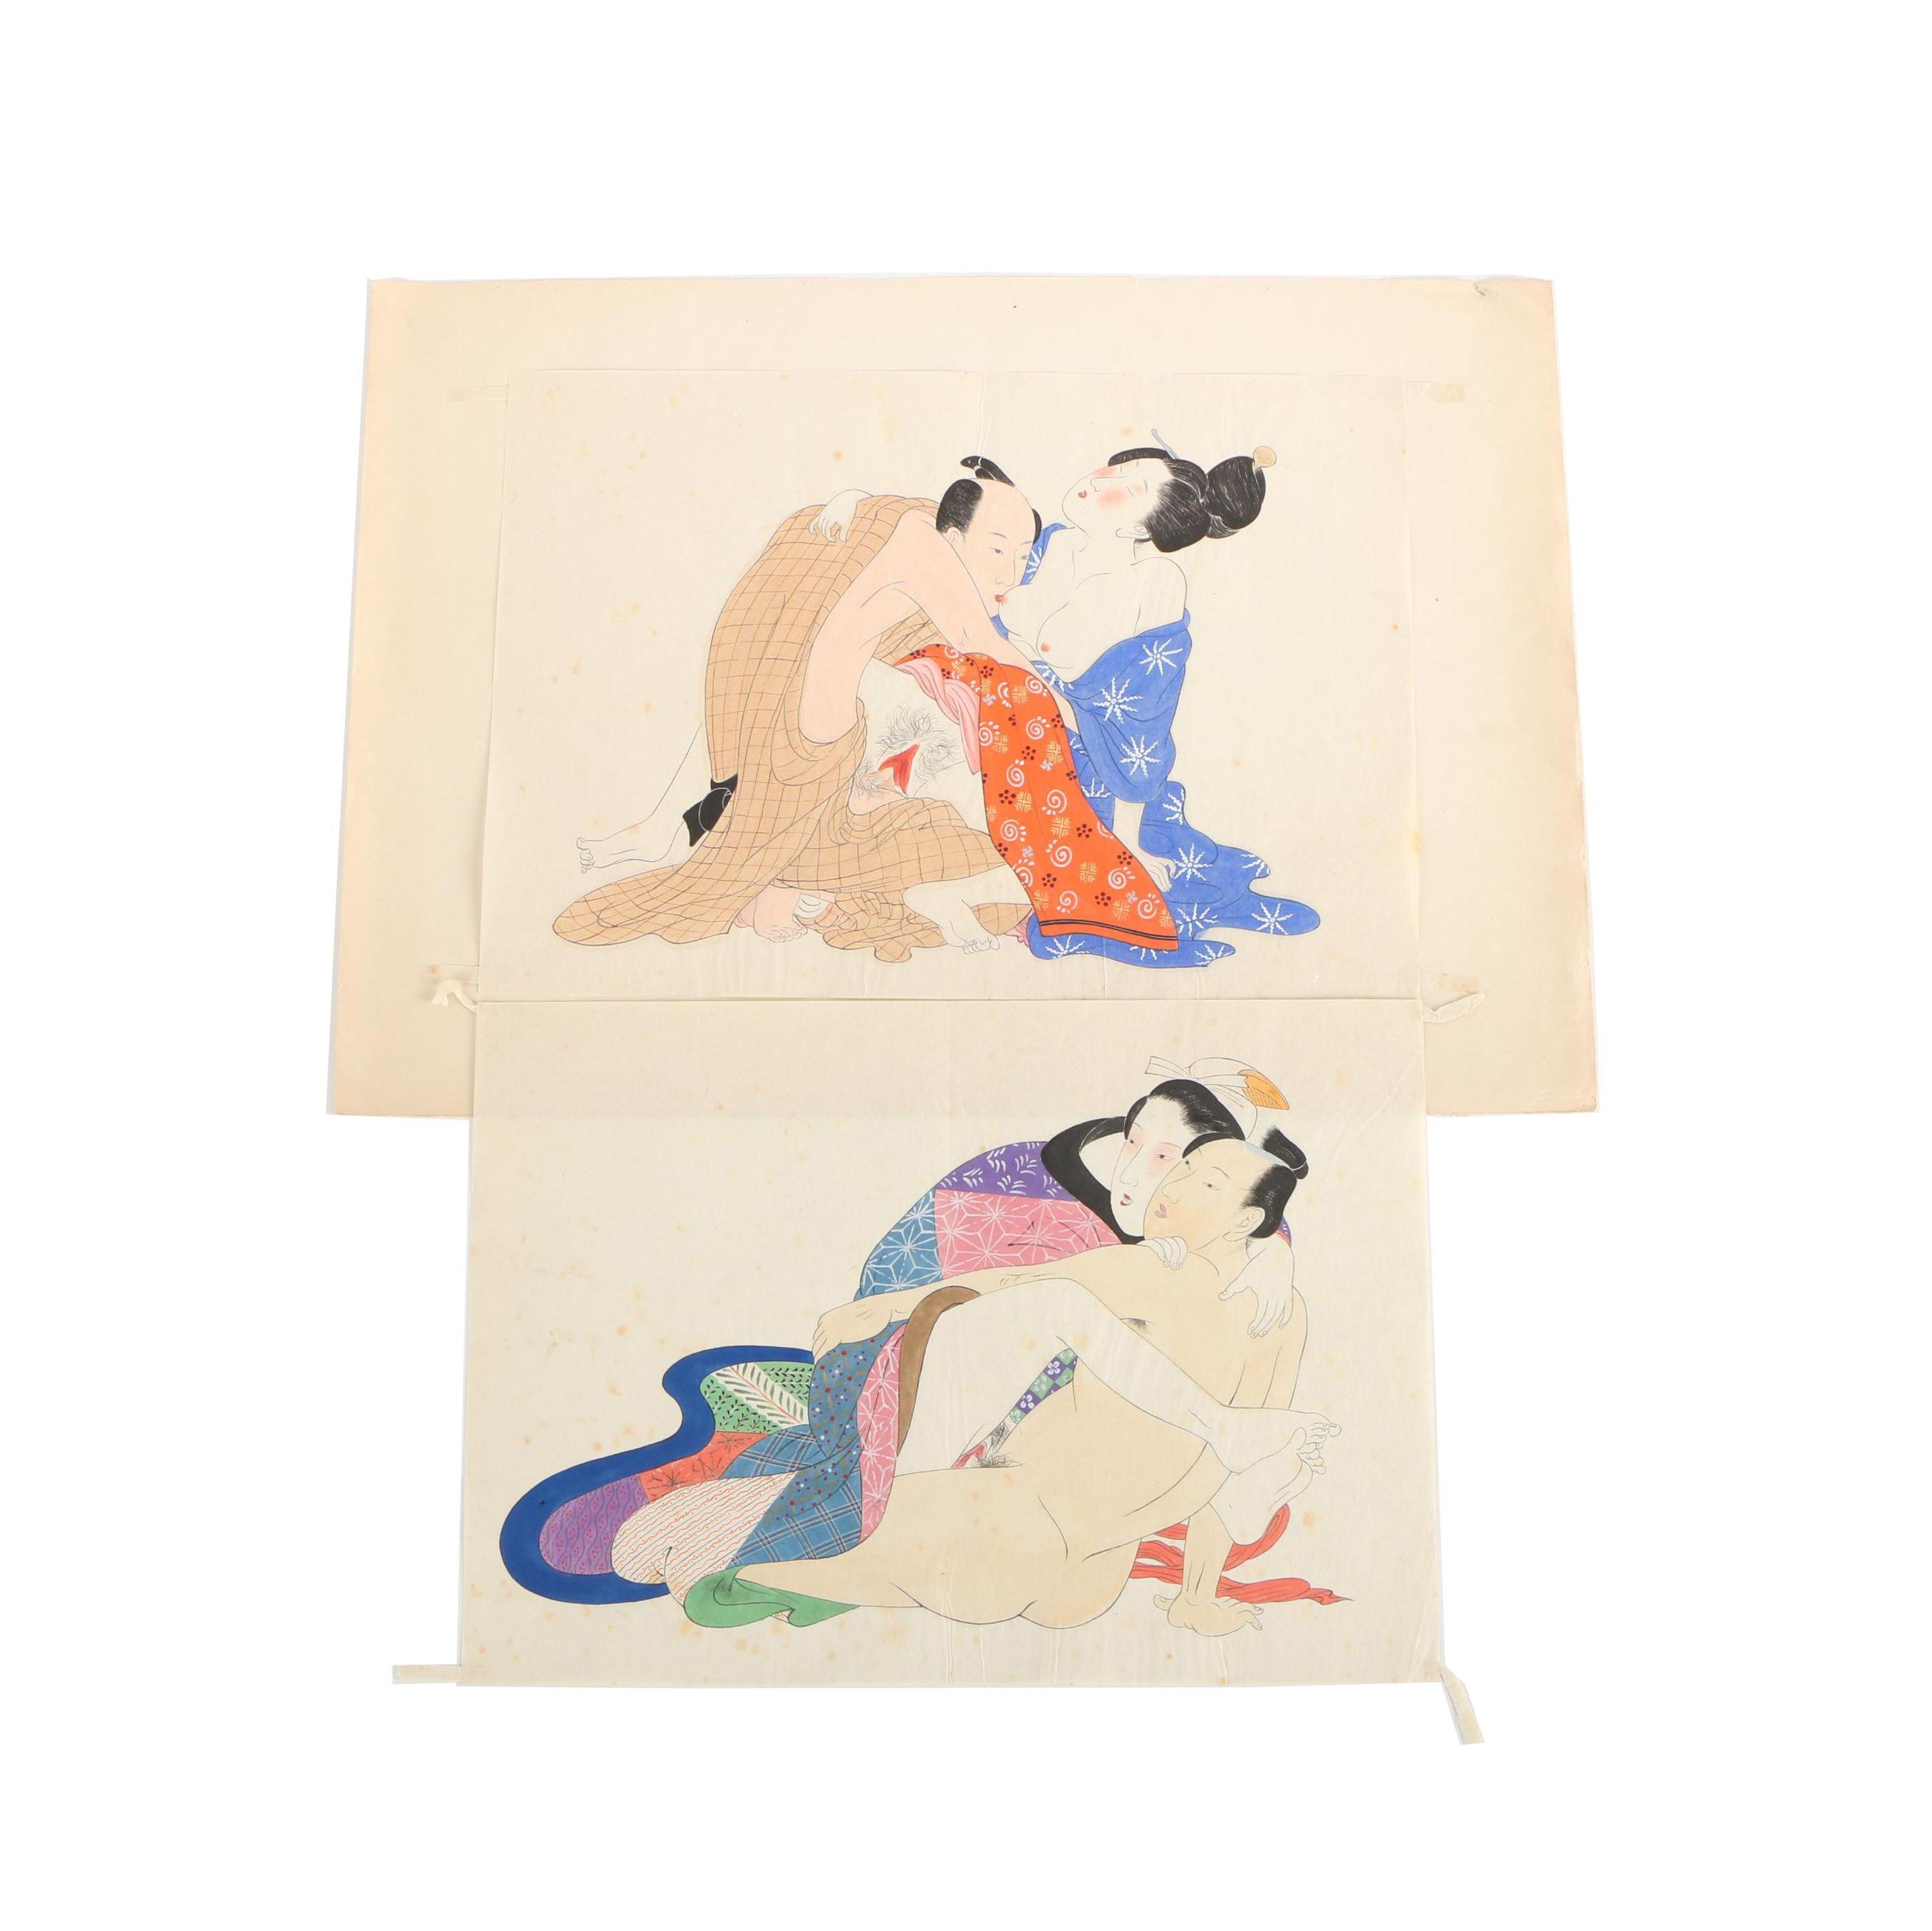 Ink and Gouache Paintings After Kitagawa Utamaro